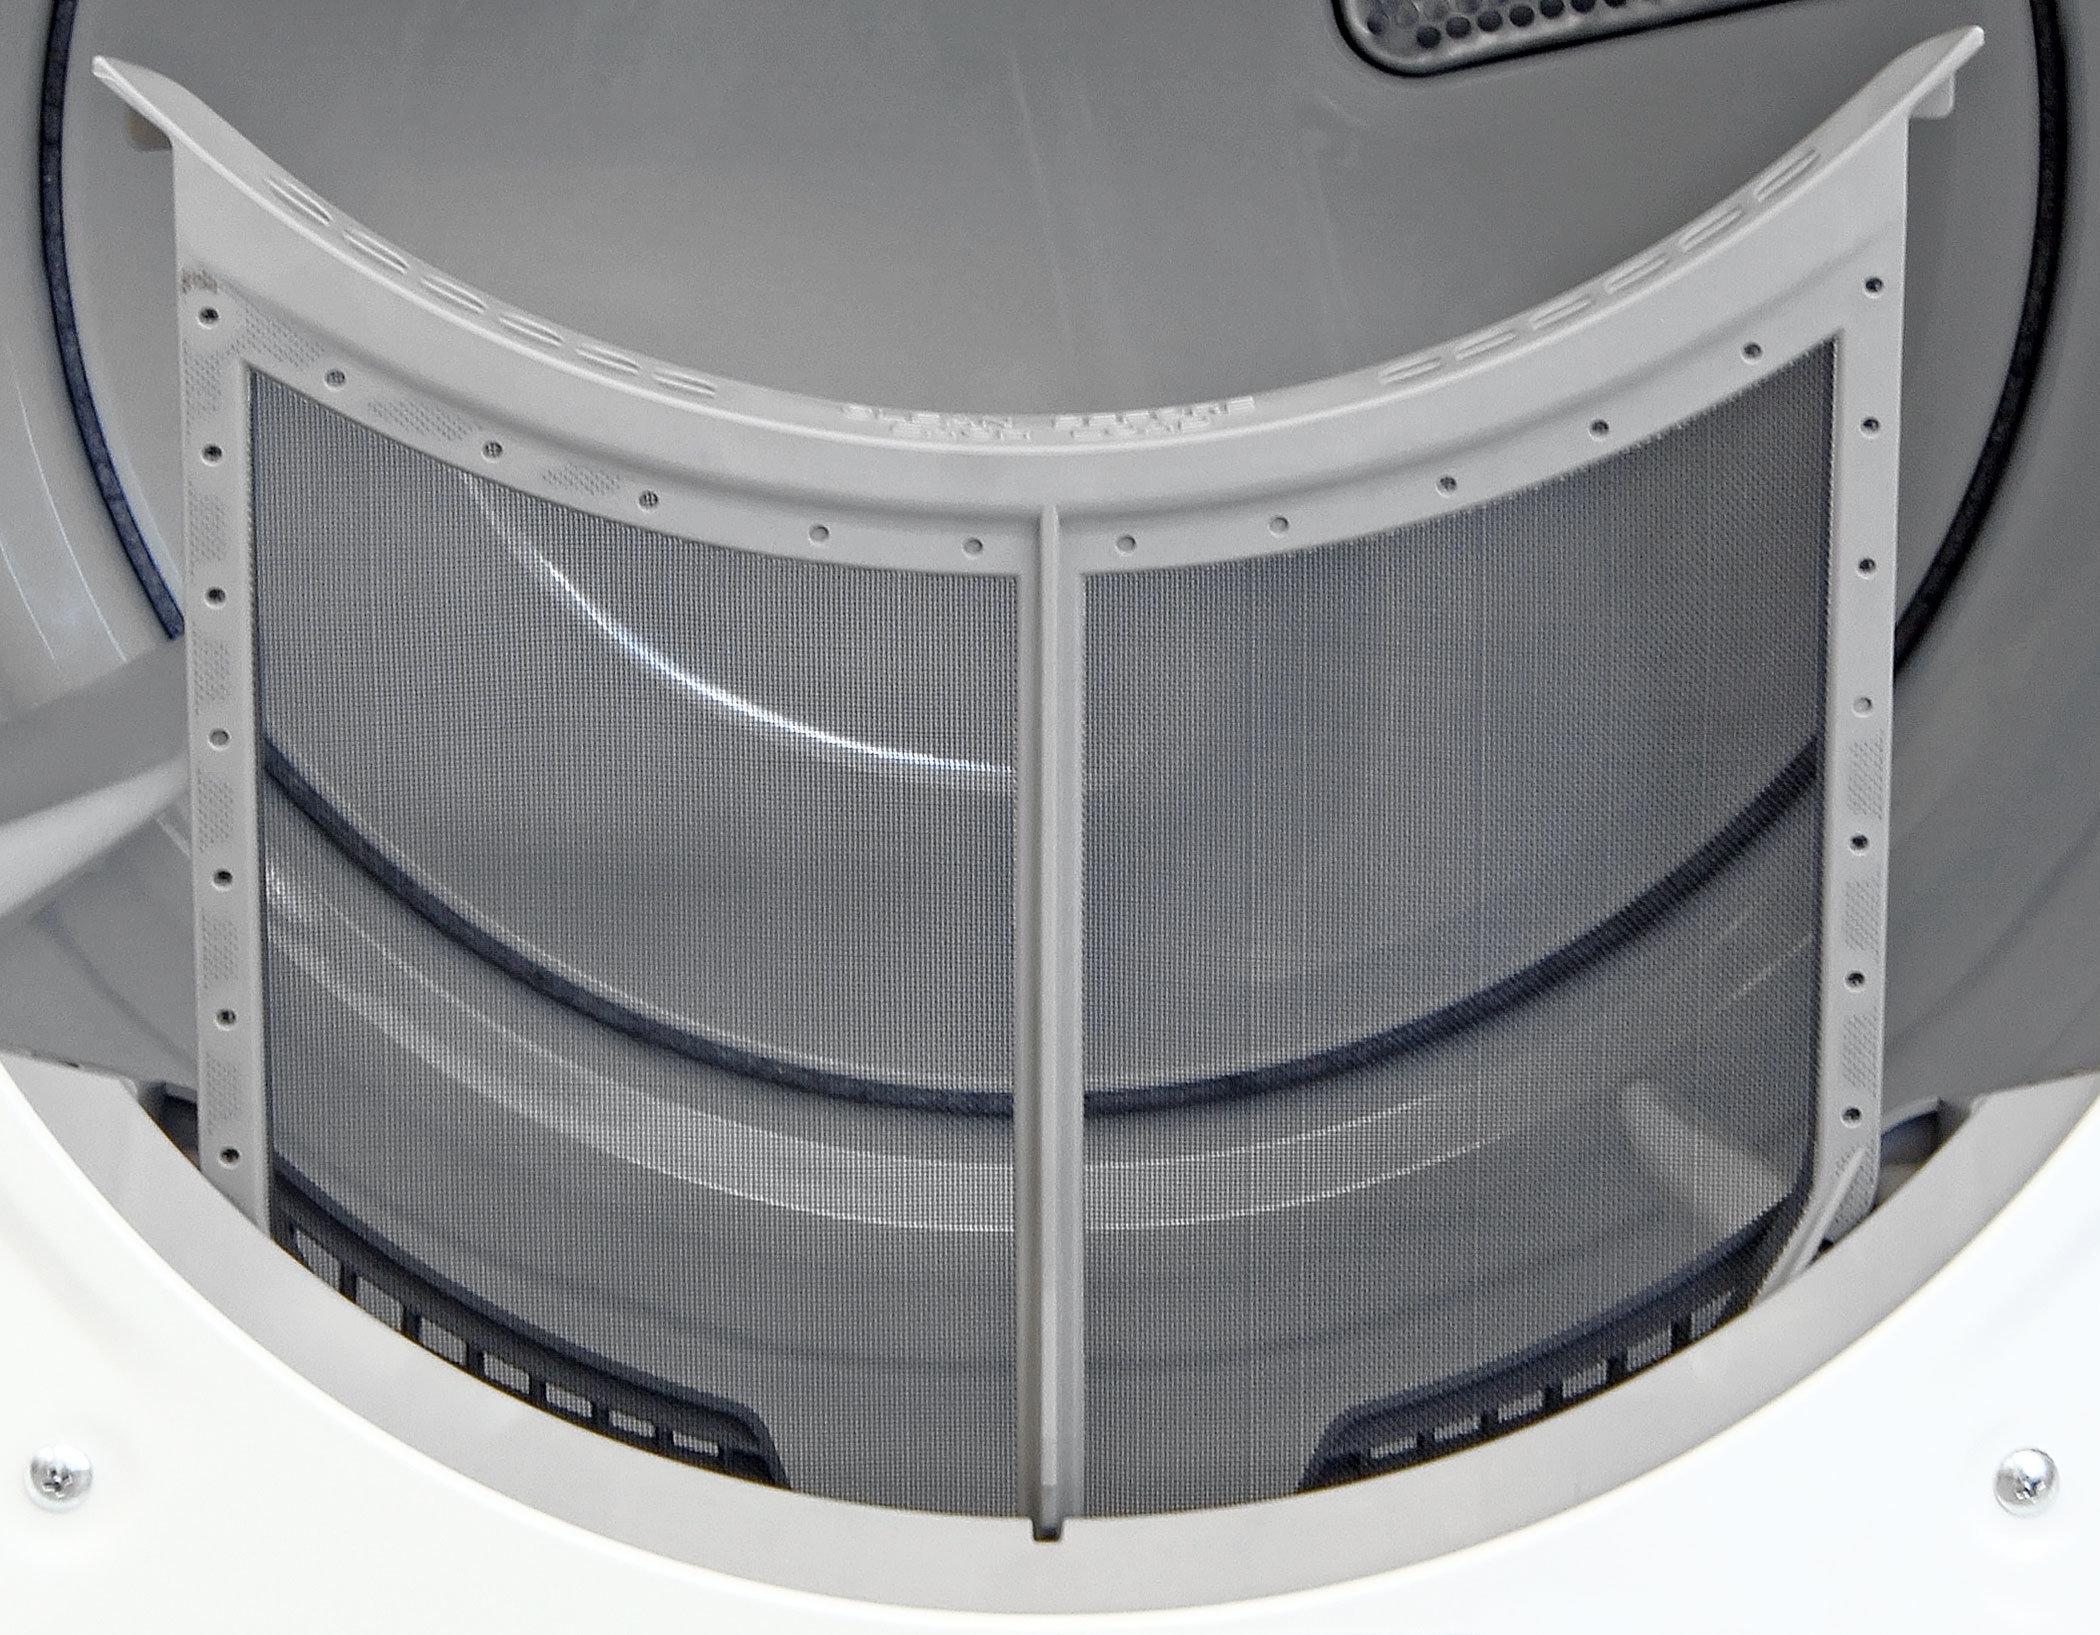 The Whirlpool Duet WGD87HEDW has a straightforward lint trap for a straightforward dryer.